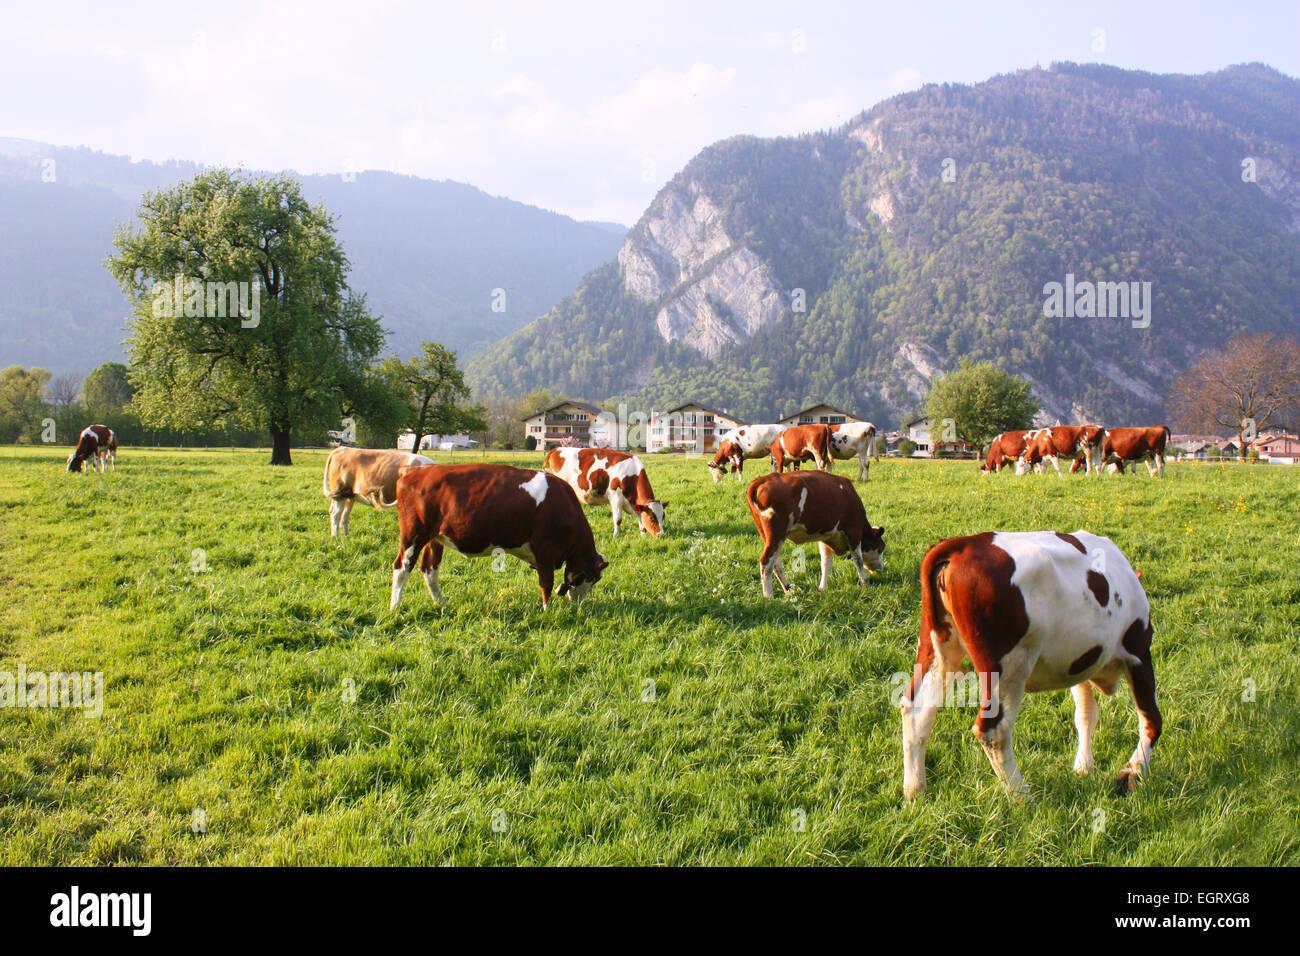 Cows grazing in a field in Switzerland Stock Photo